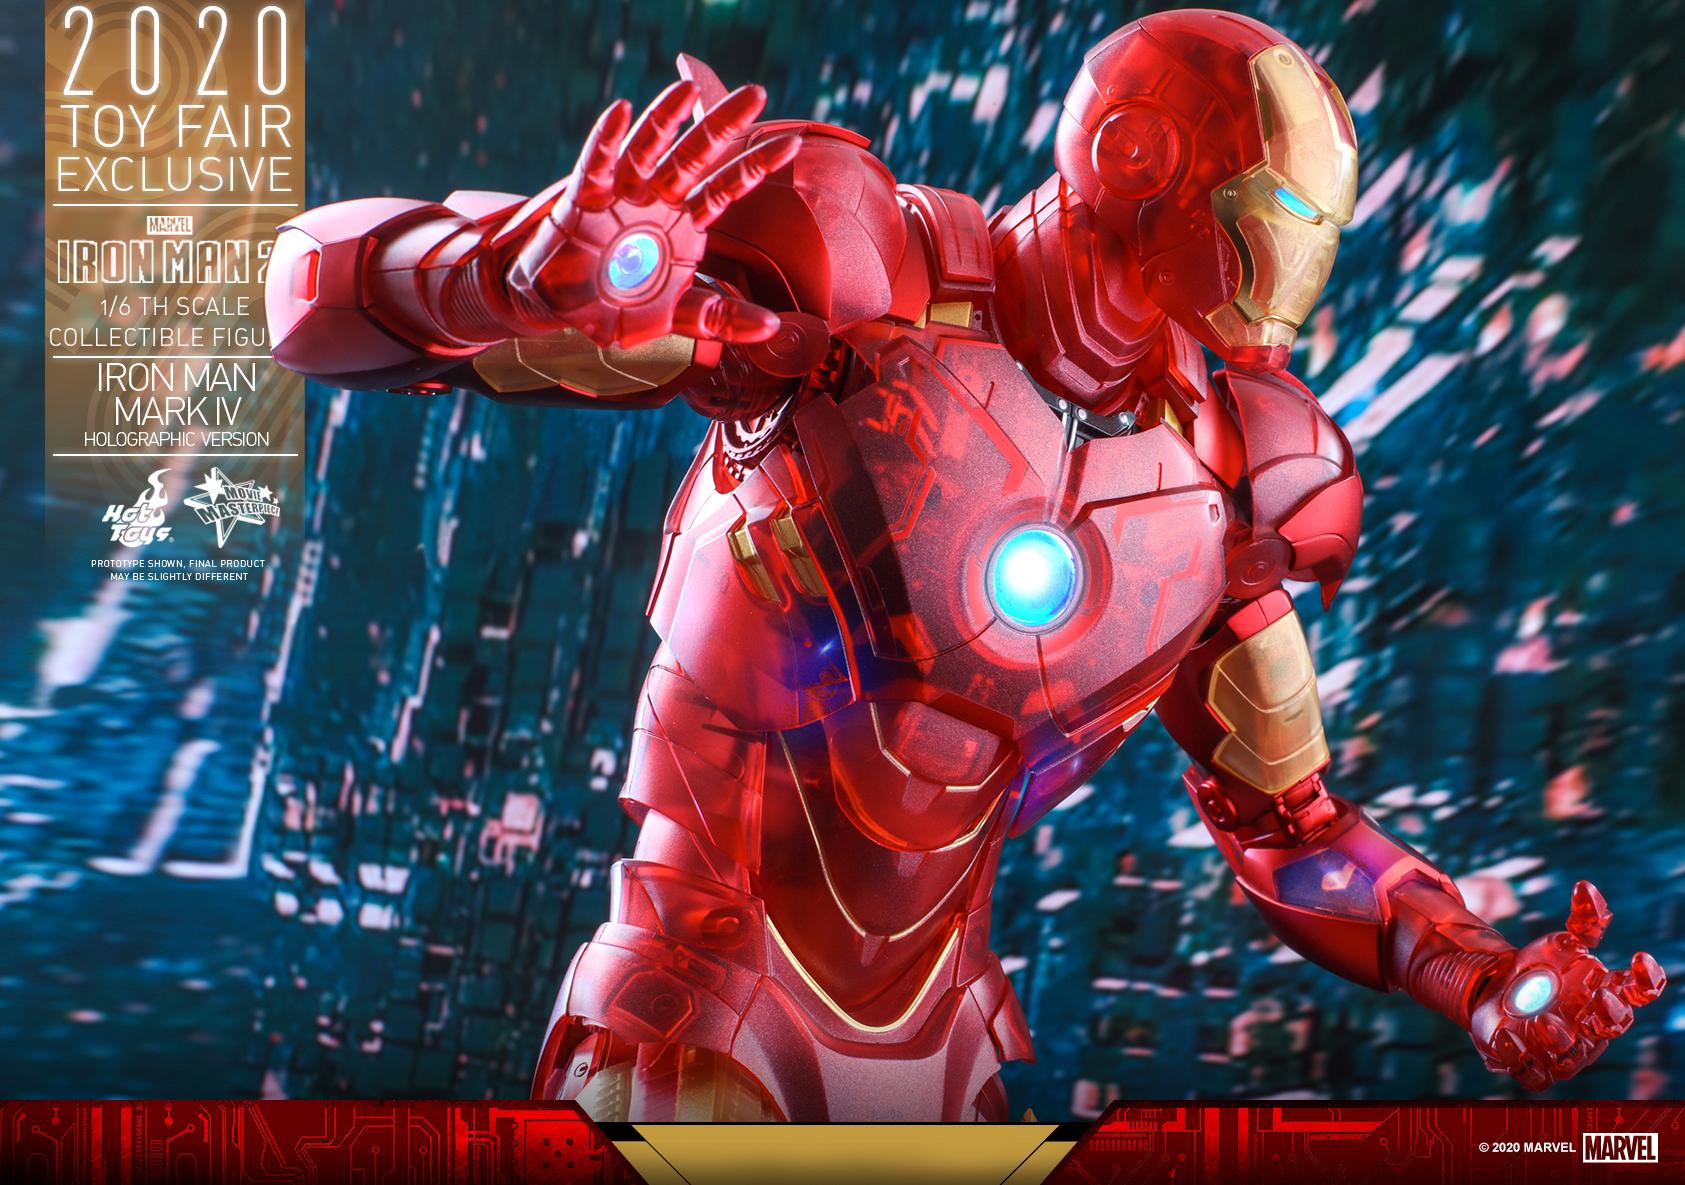 Hot Toys - IM2 - Iron Man Mark IV (Holographic Version) collectible figure_PR18